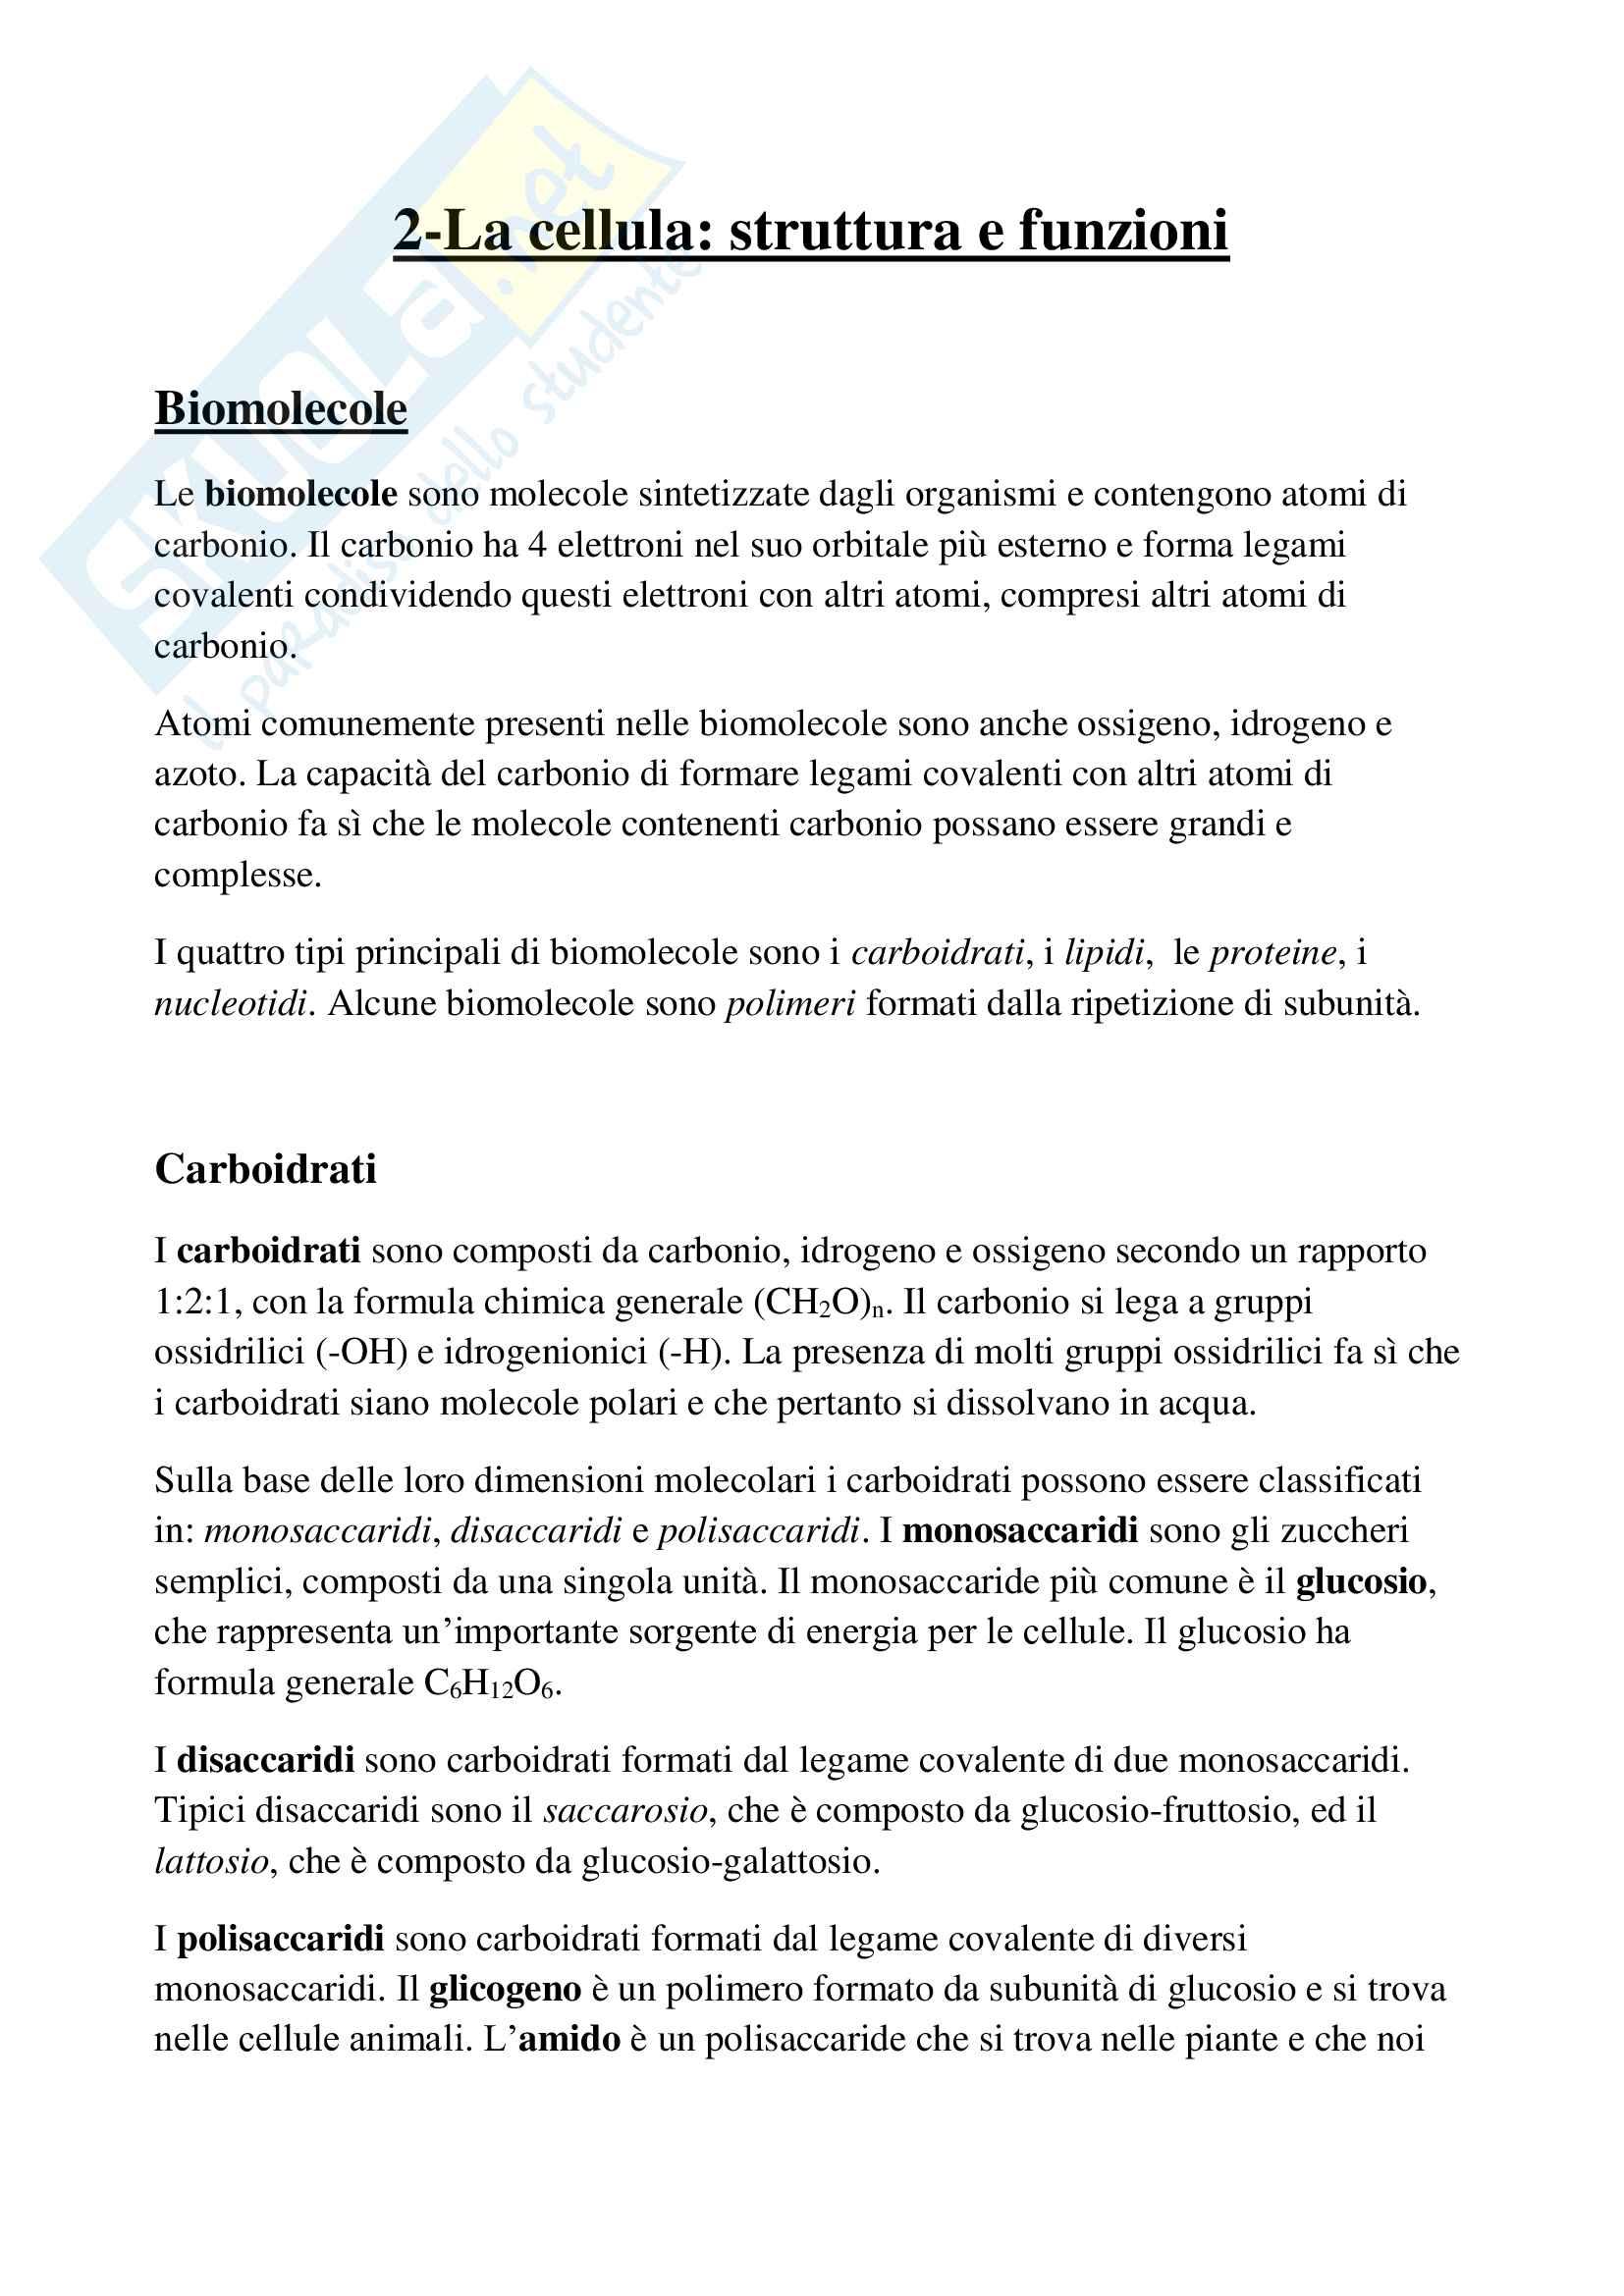 Appunti di Fondamenti di Biologia Anatomia e Fisiologia